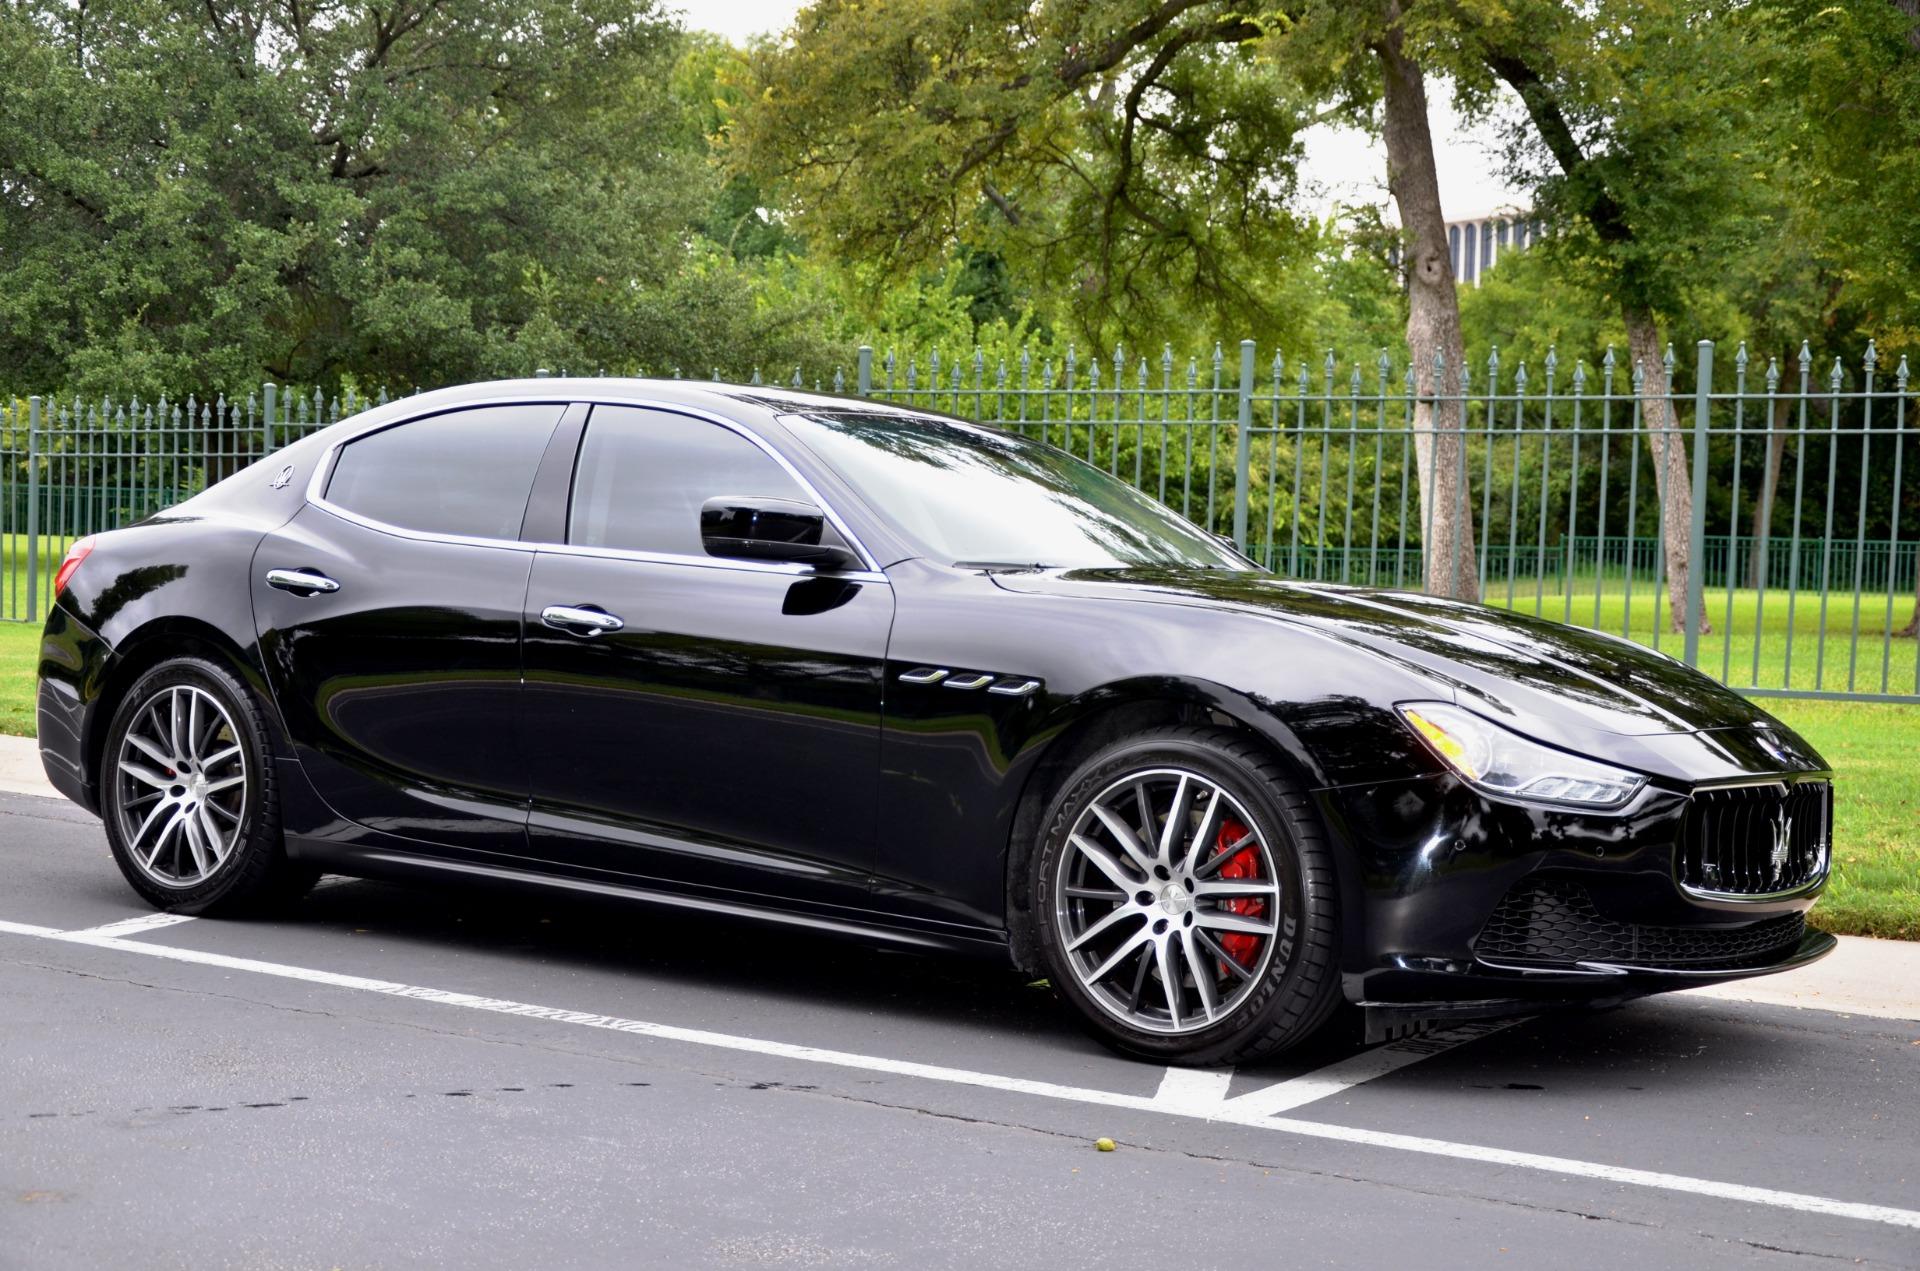 Used 2014 Maserati Ghibli S Q4 | Dallas, TX